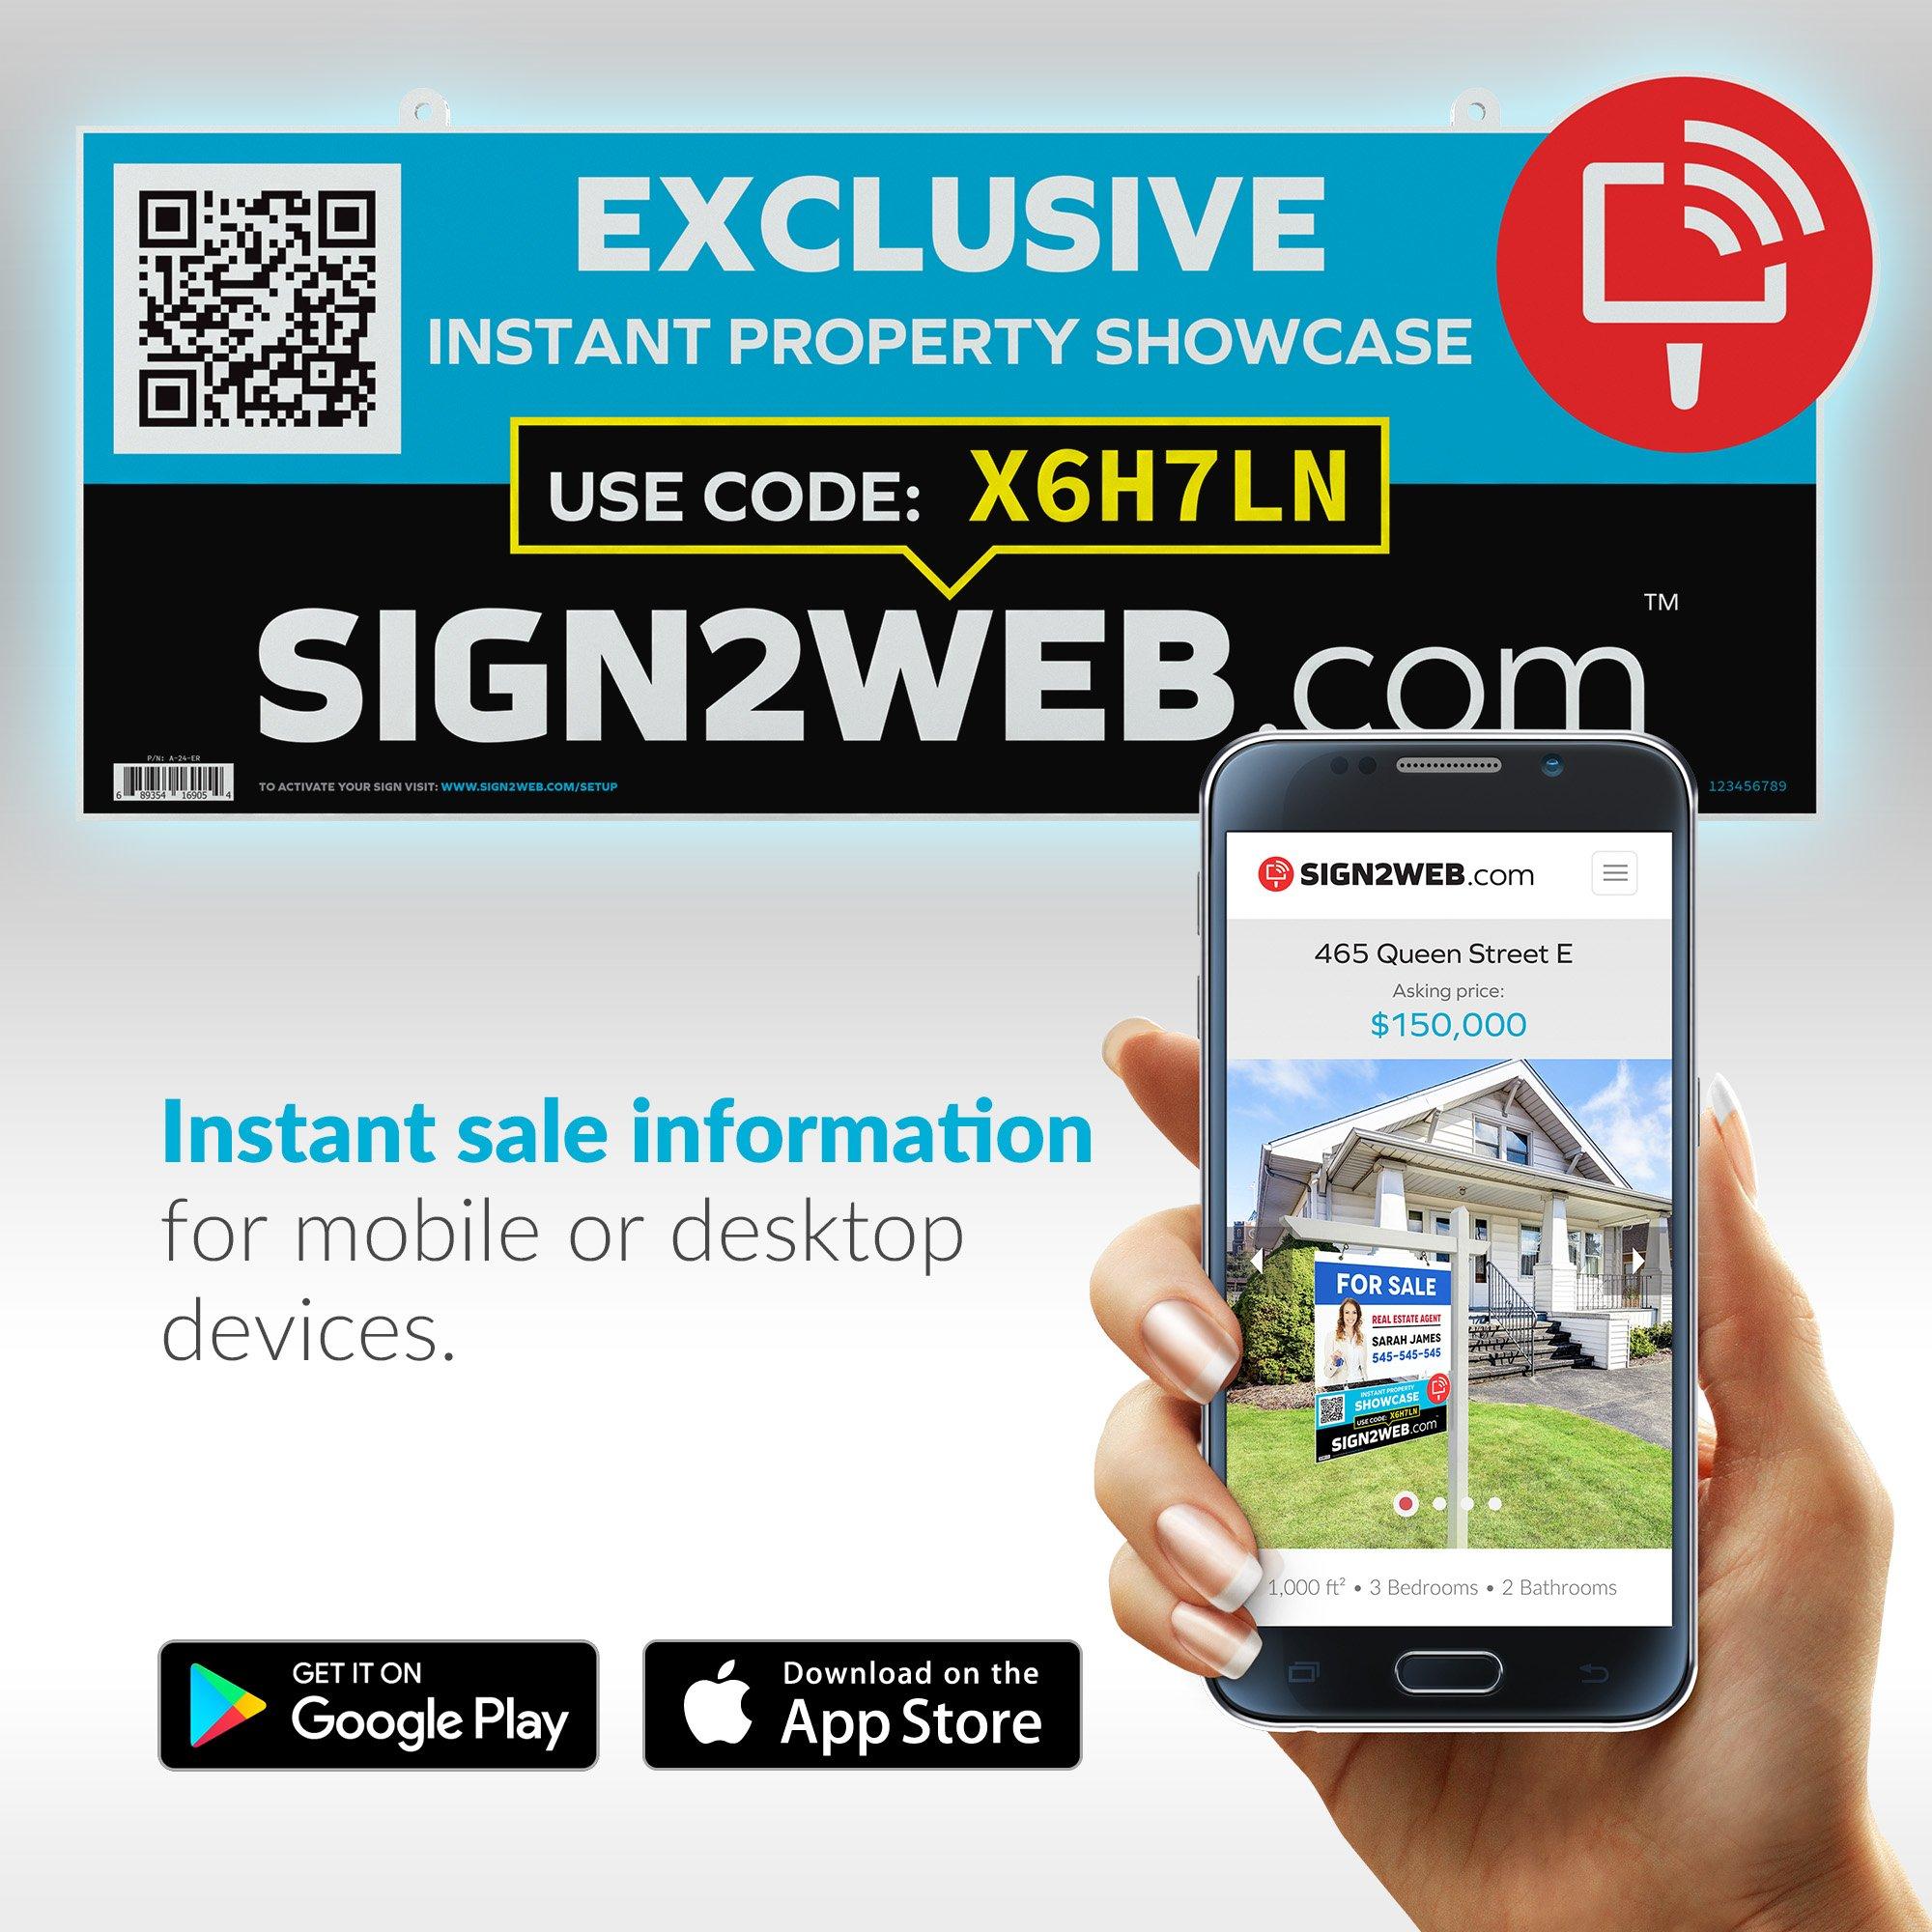 Web Enabled Realtor Exclusive Sign Rider + Website - Laser Printed High Visibility Real Estate Exclusive Sign Rider - Double Sided 24'' Real Estate Agent Sign Rider - Evolved Agent Sign Solution!